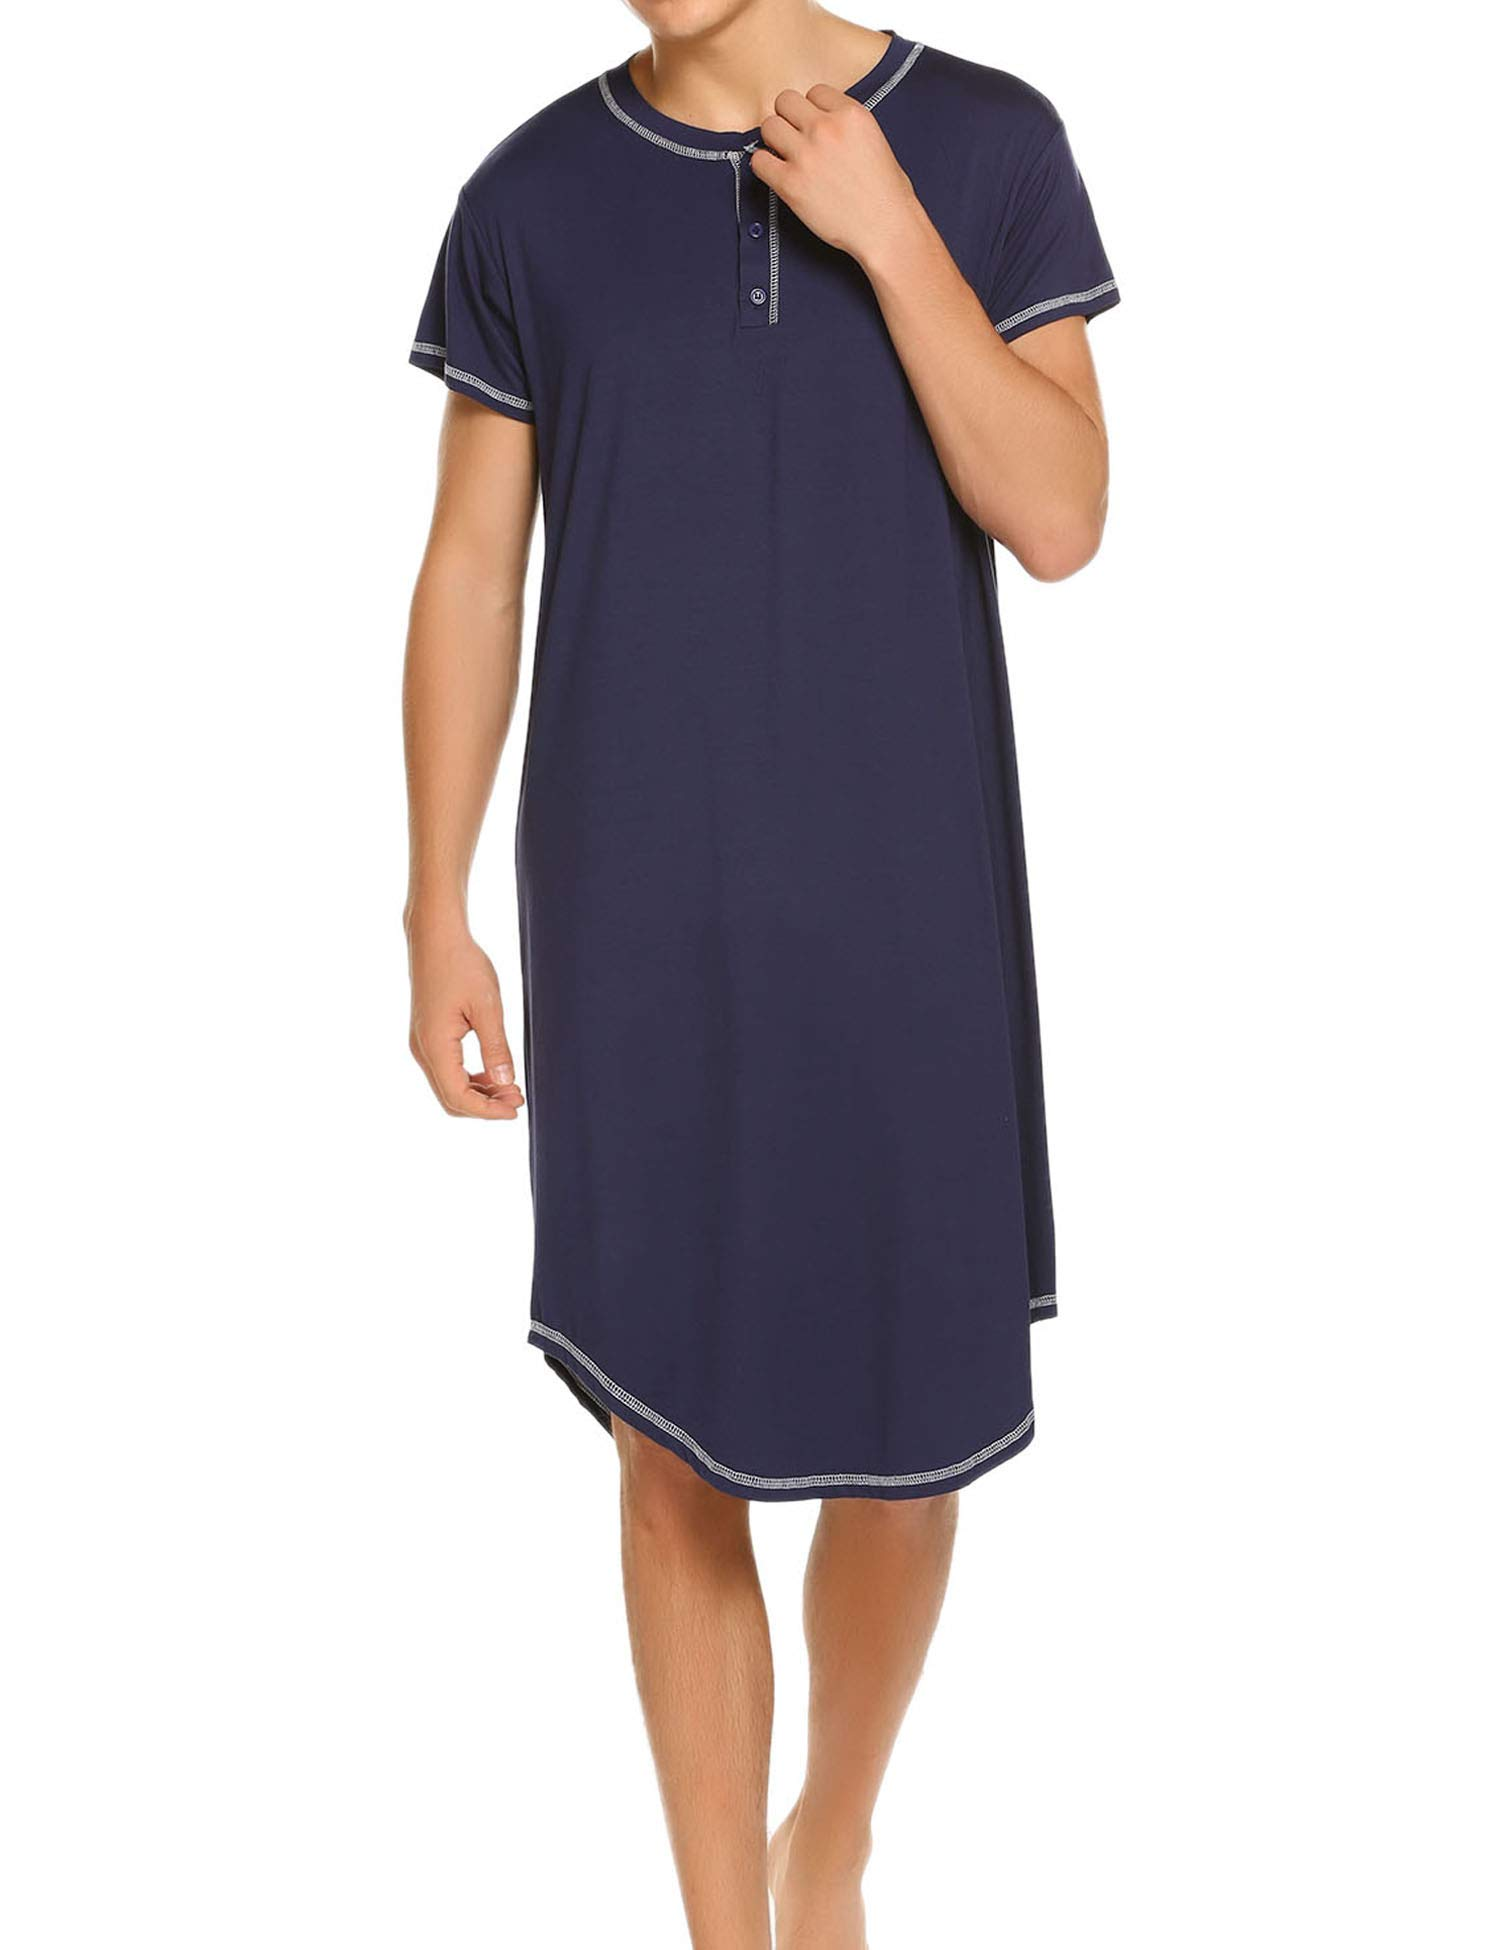 Ekouaer Men's Nightshirt, Cotton Nightwear Comfy Big&Tall V Neck Long Sleeve Soft Loose Pajama Sleep Shirt, Navy Blue, X Large